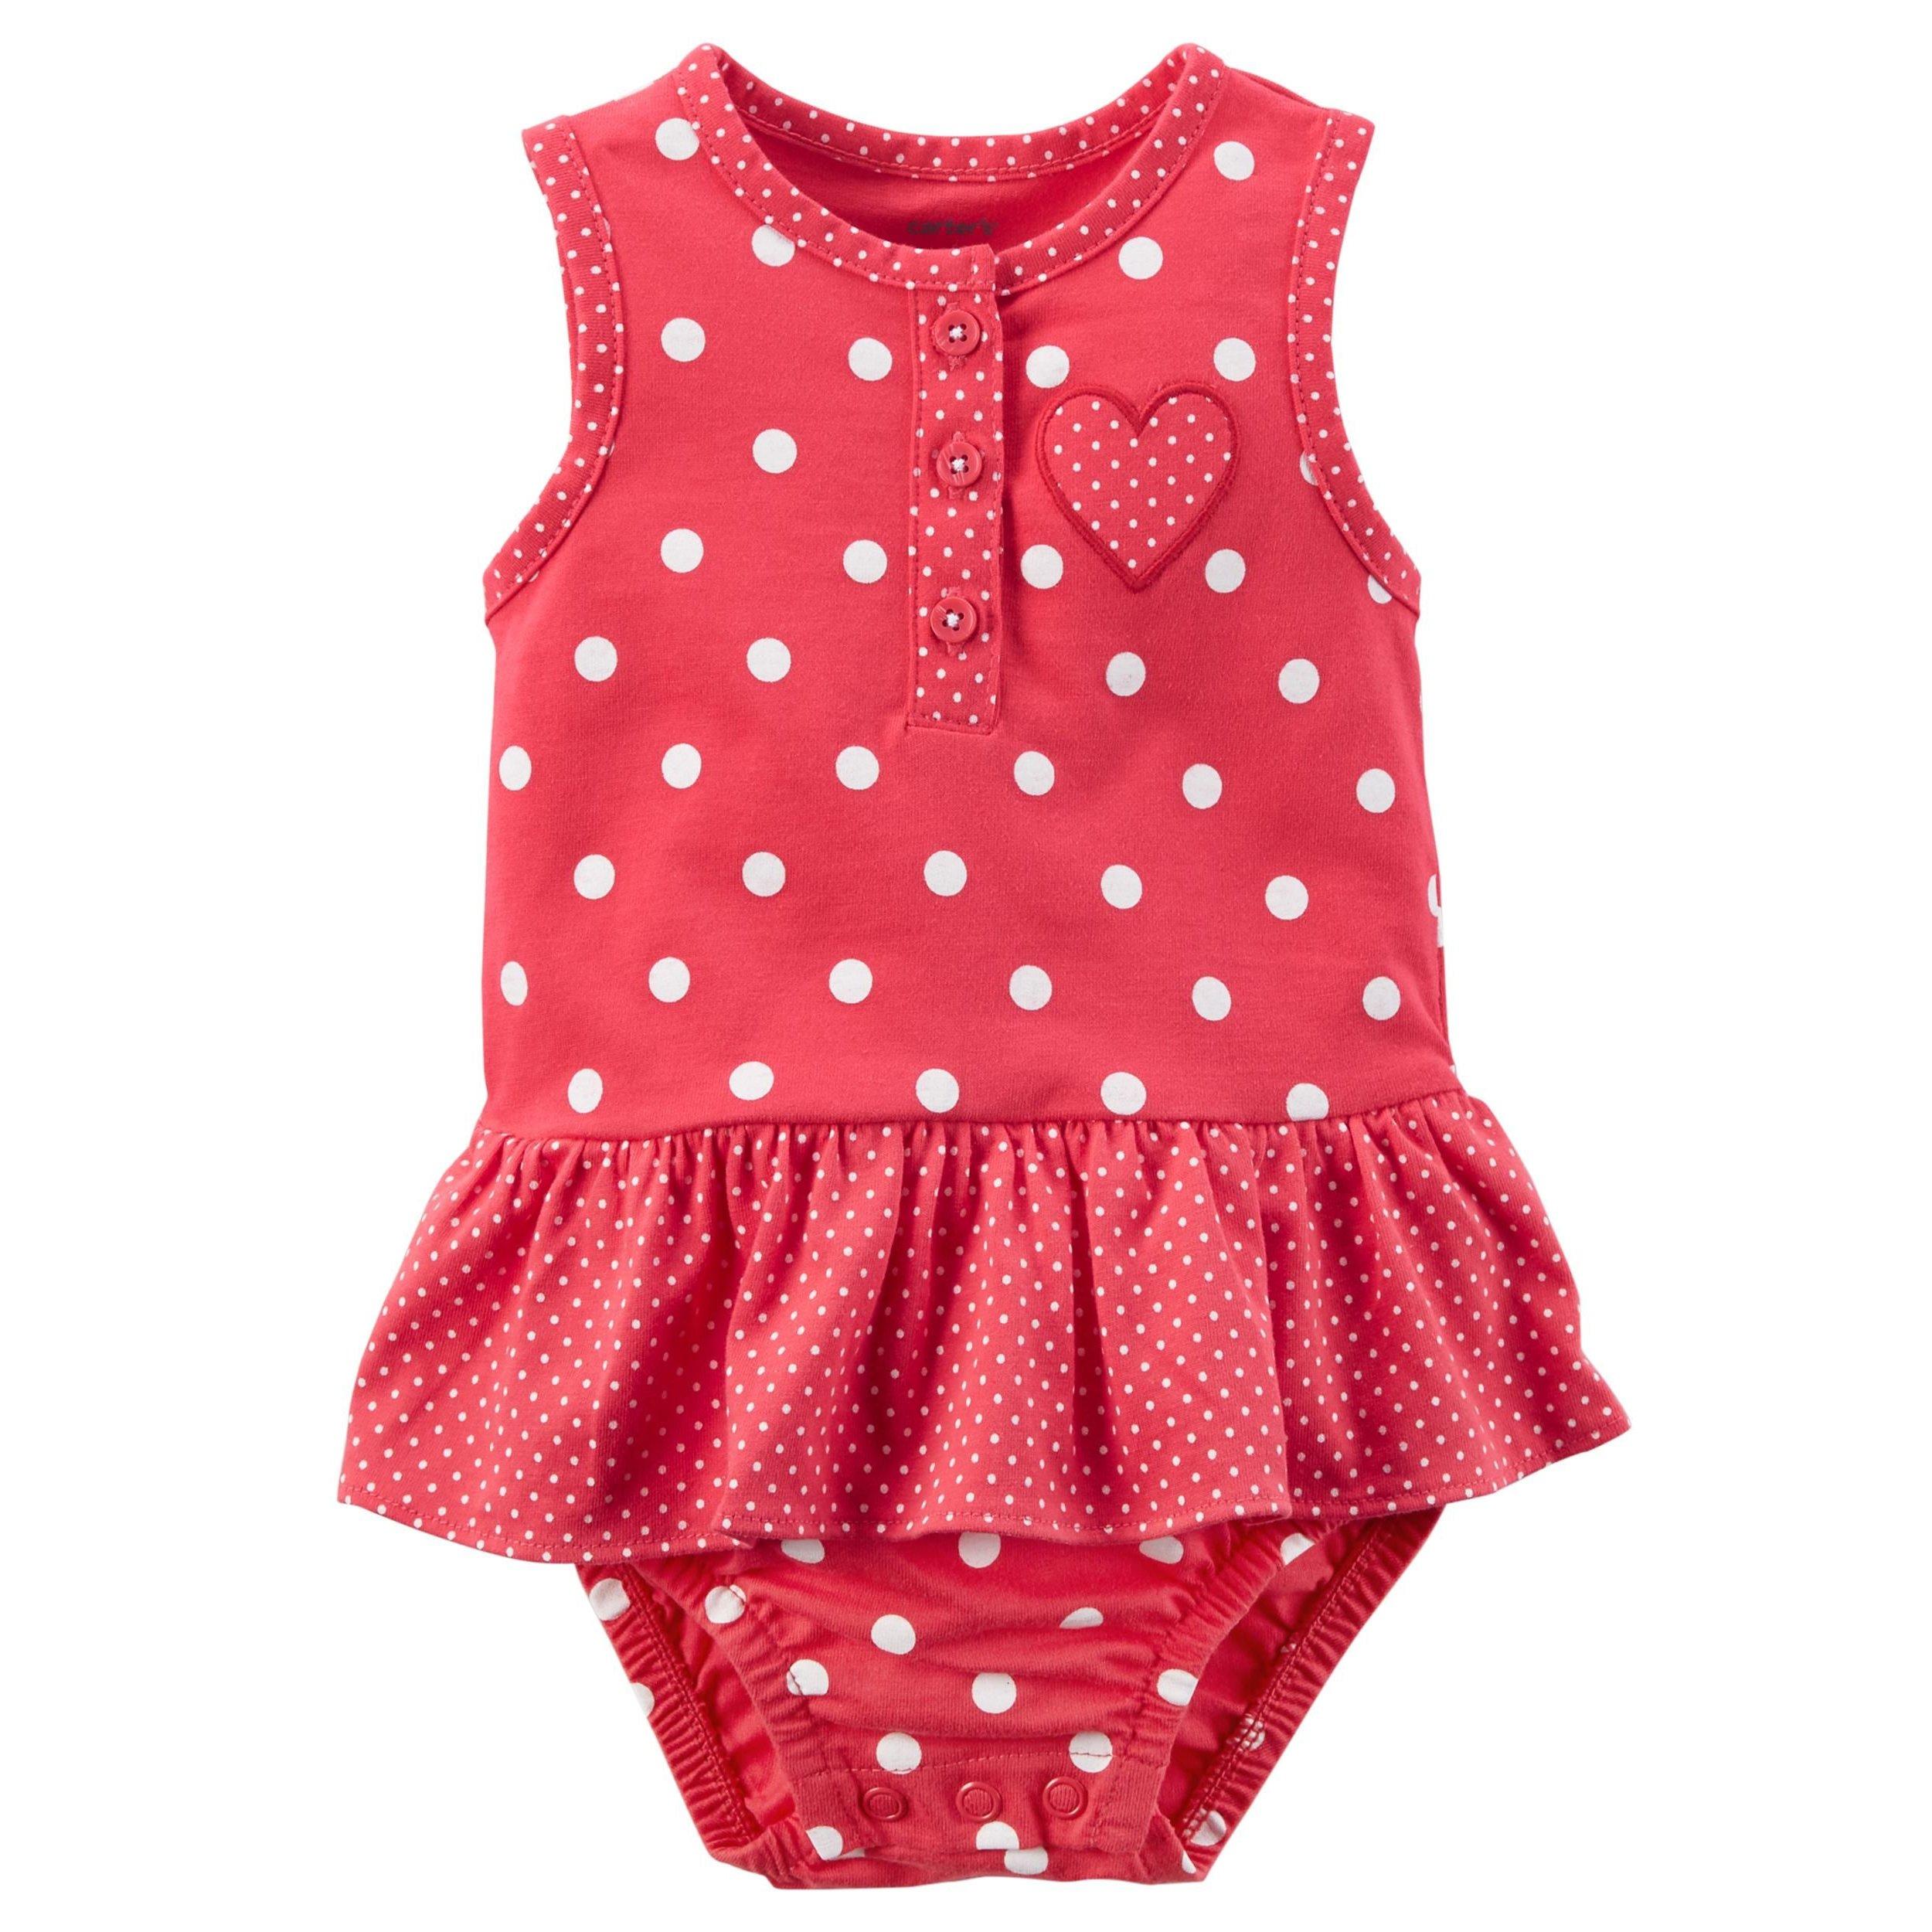 Carter's Baby Girls' Polka Dot Heart Sunsuit 3 Months